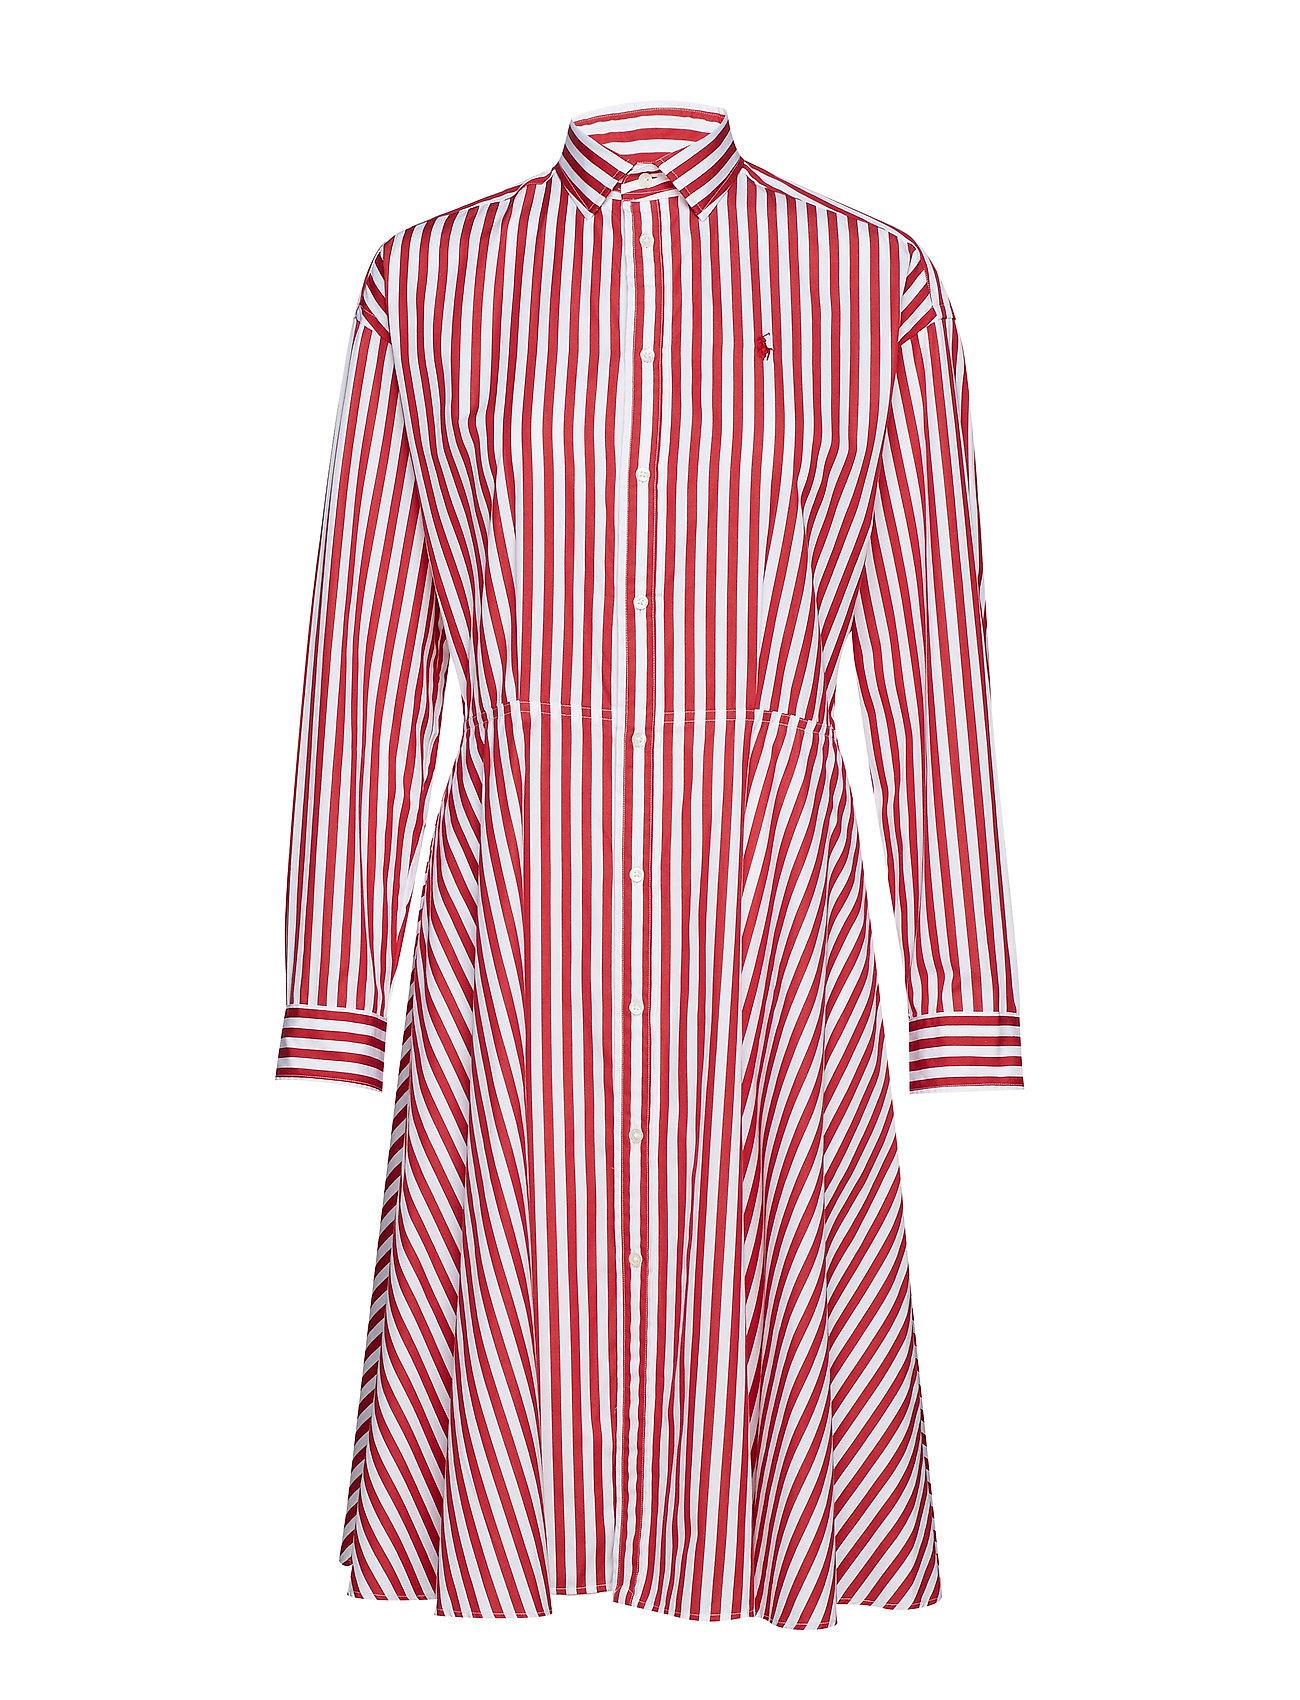 Polo Ralph Lauren Cotton Broadcloth Shirtdress